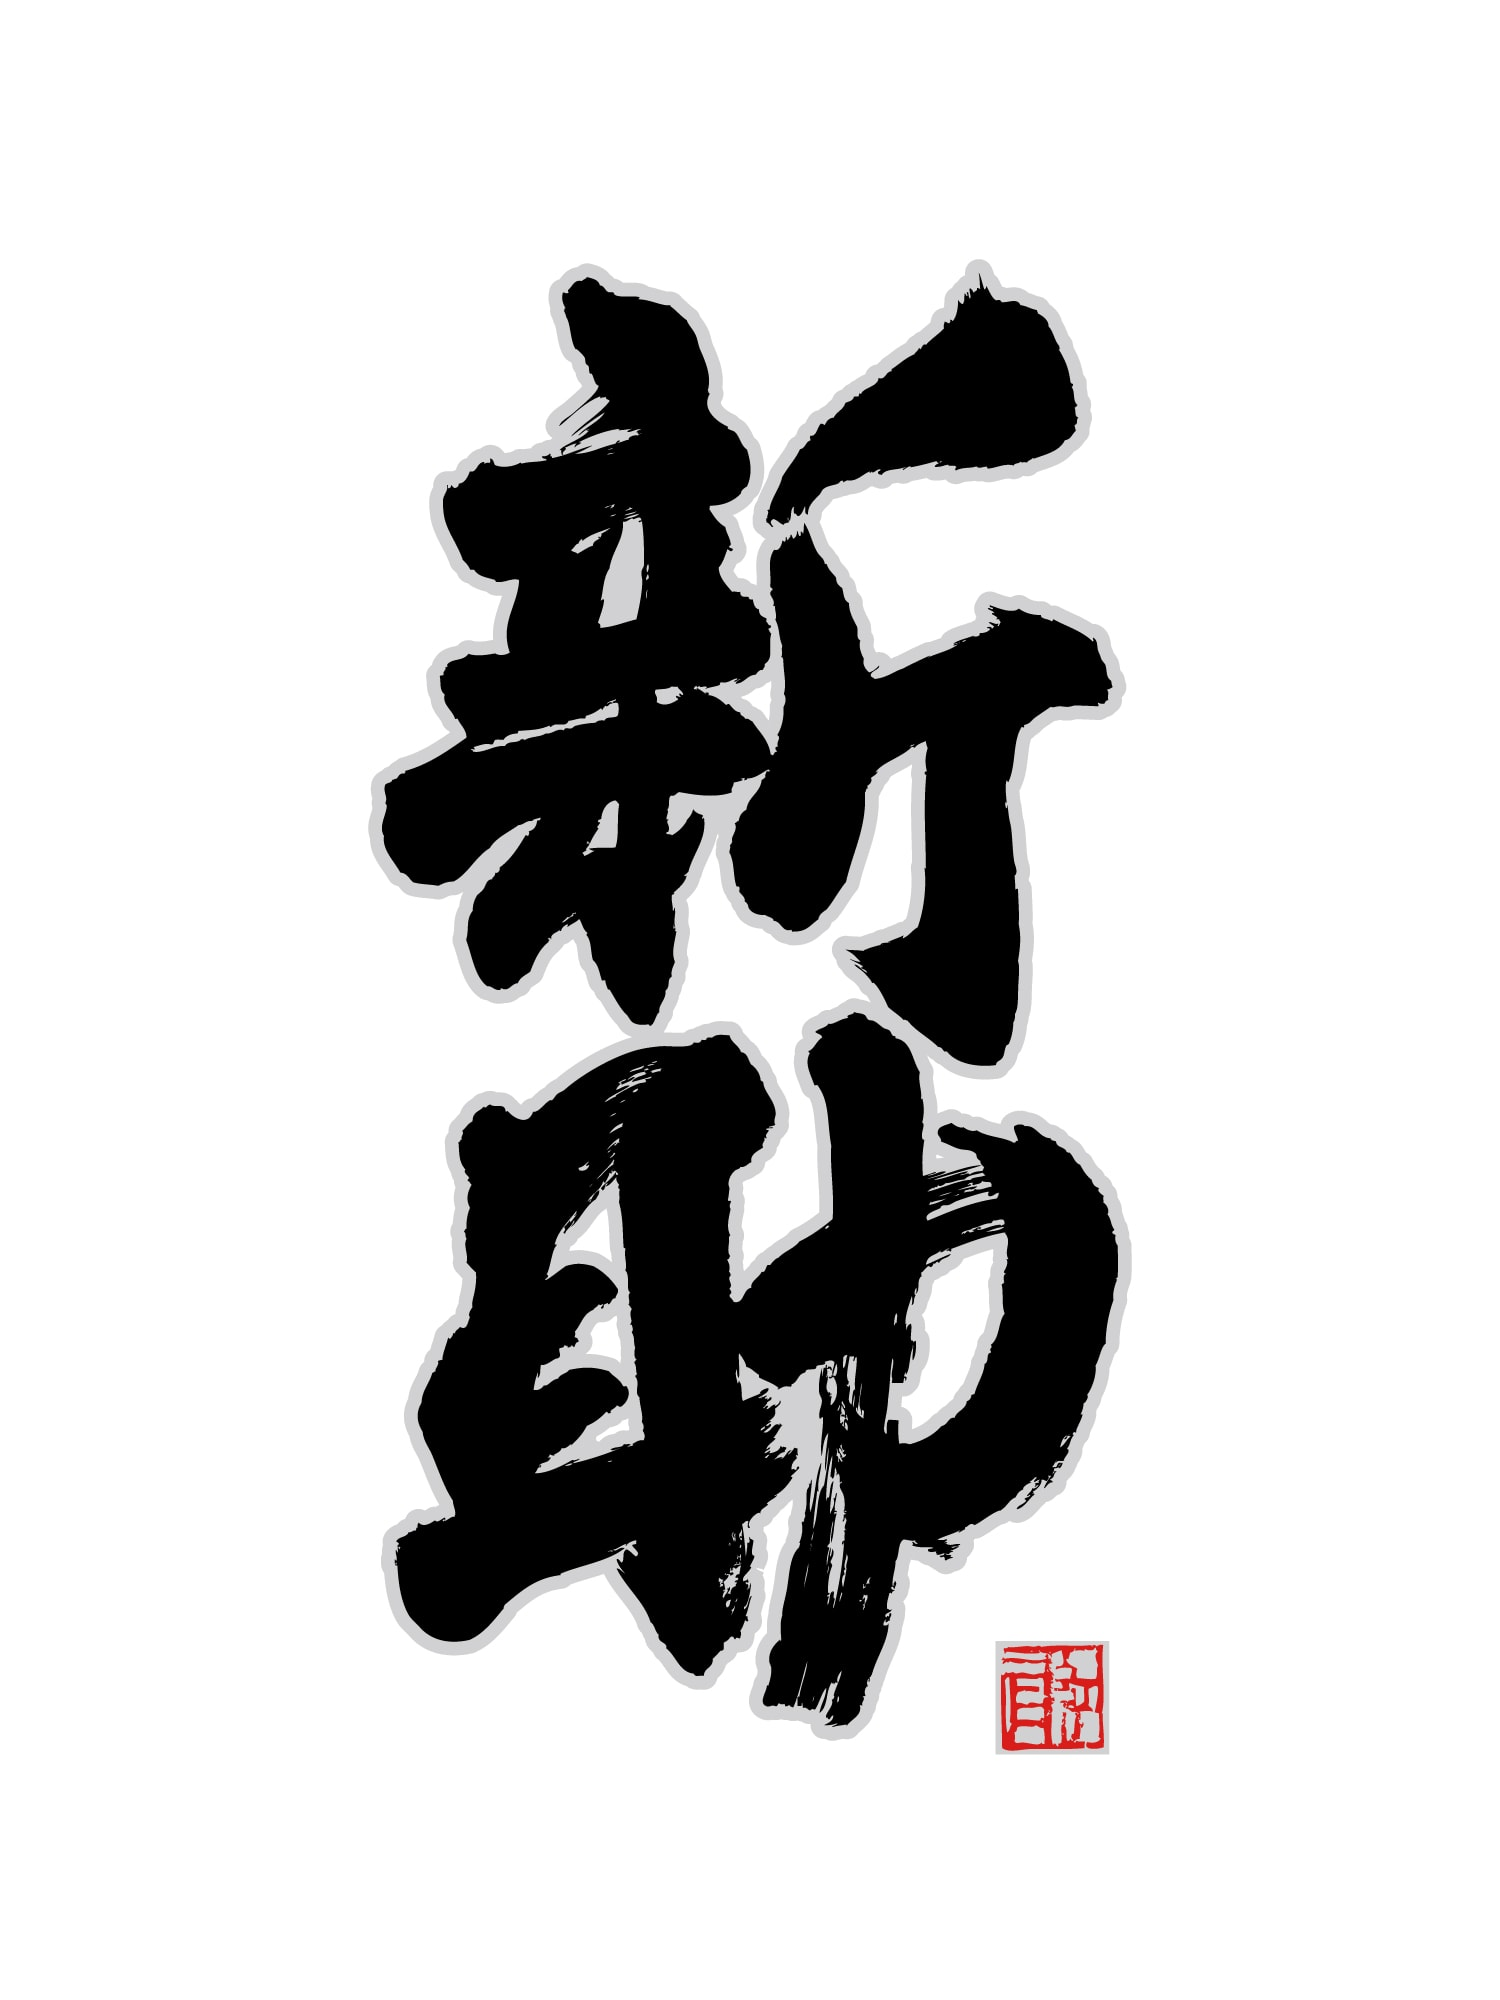 新助 アトレ新浦安店 / 新浦安 17